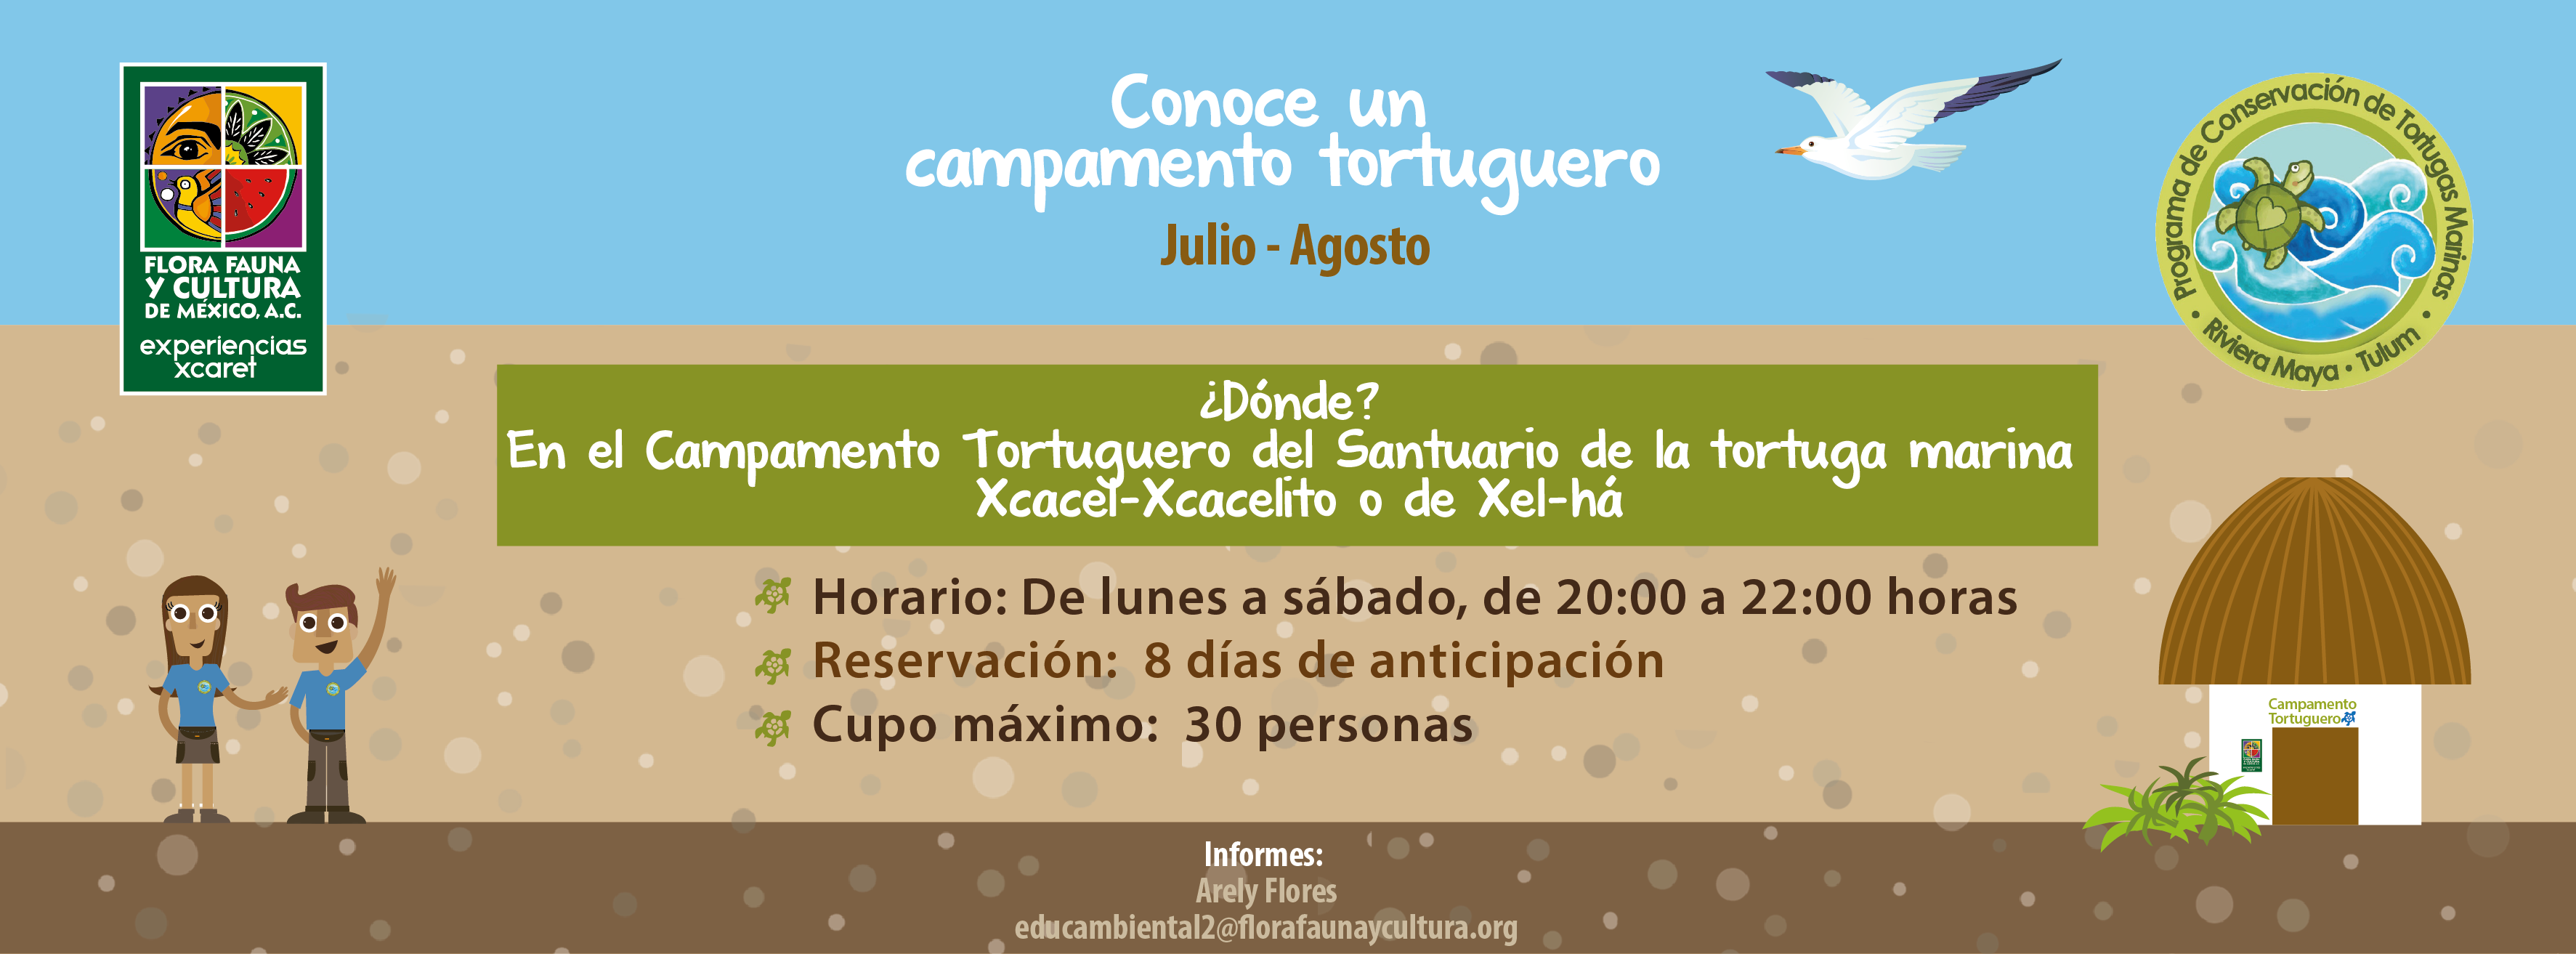 Conociendo un Campamento Tortuguero